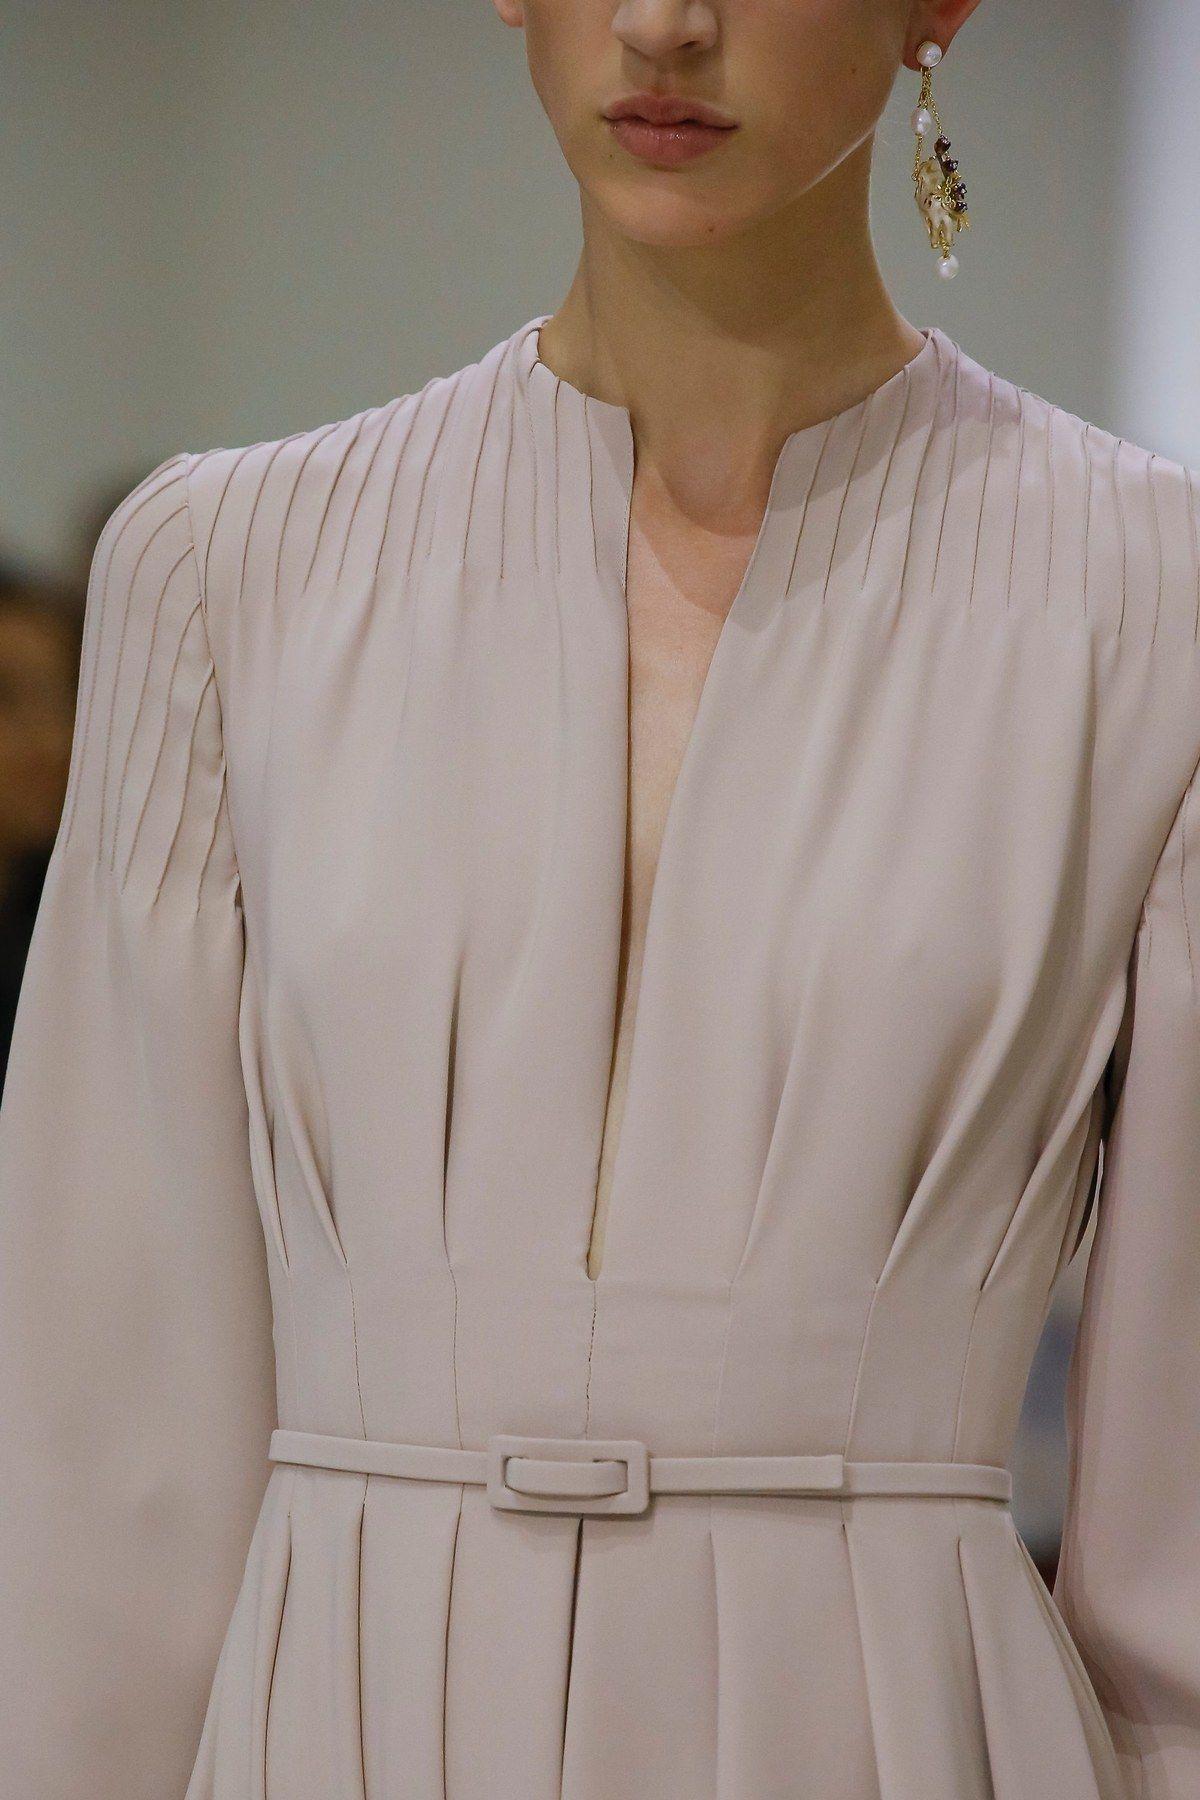 Christian Dior Fall 2018 Couture Fashion Show